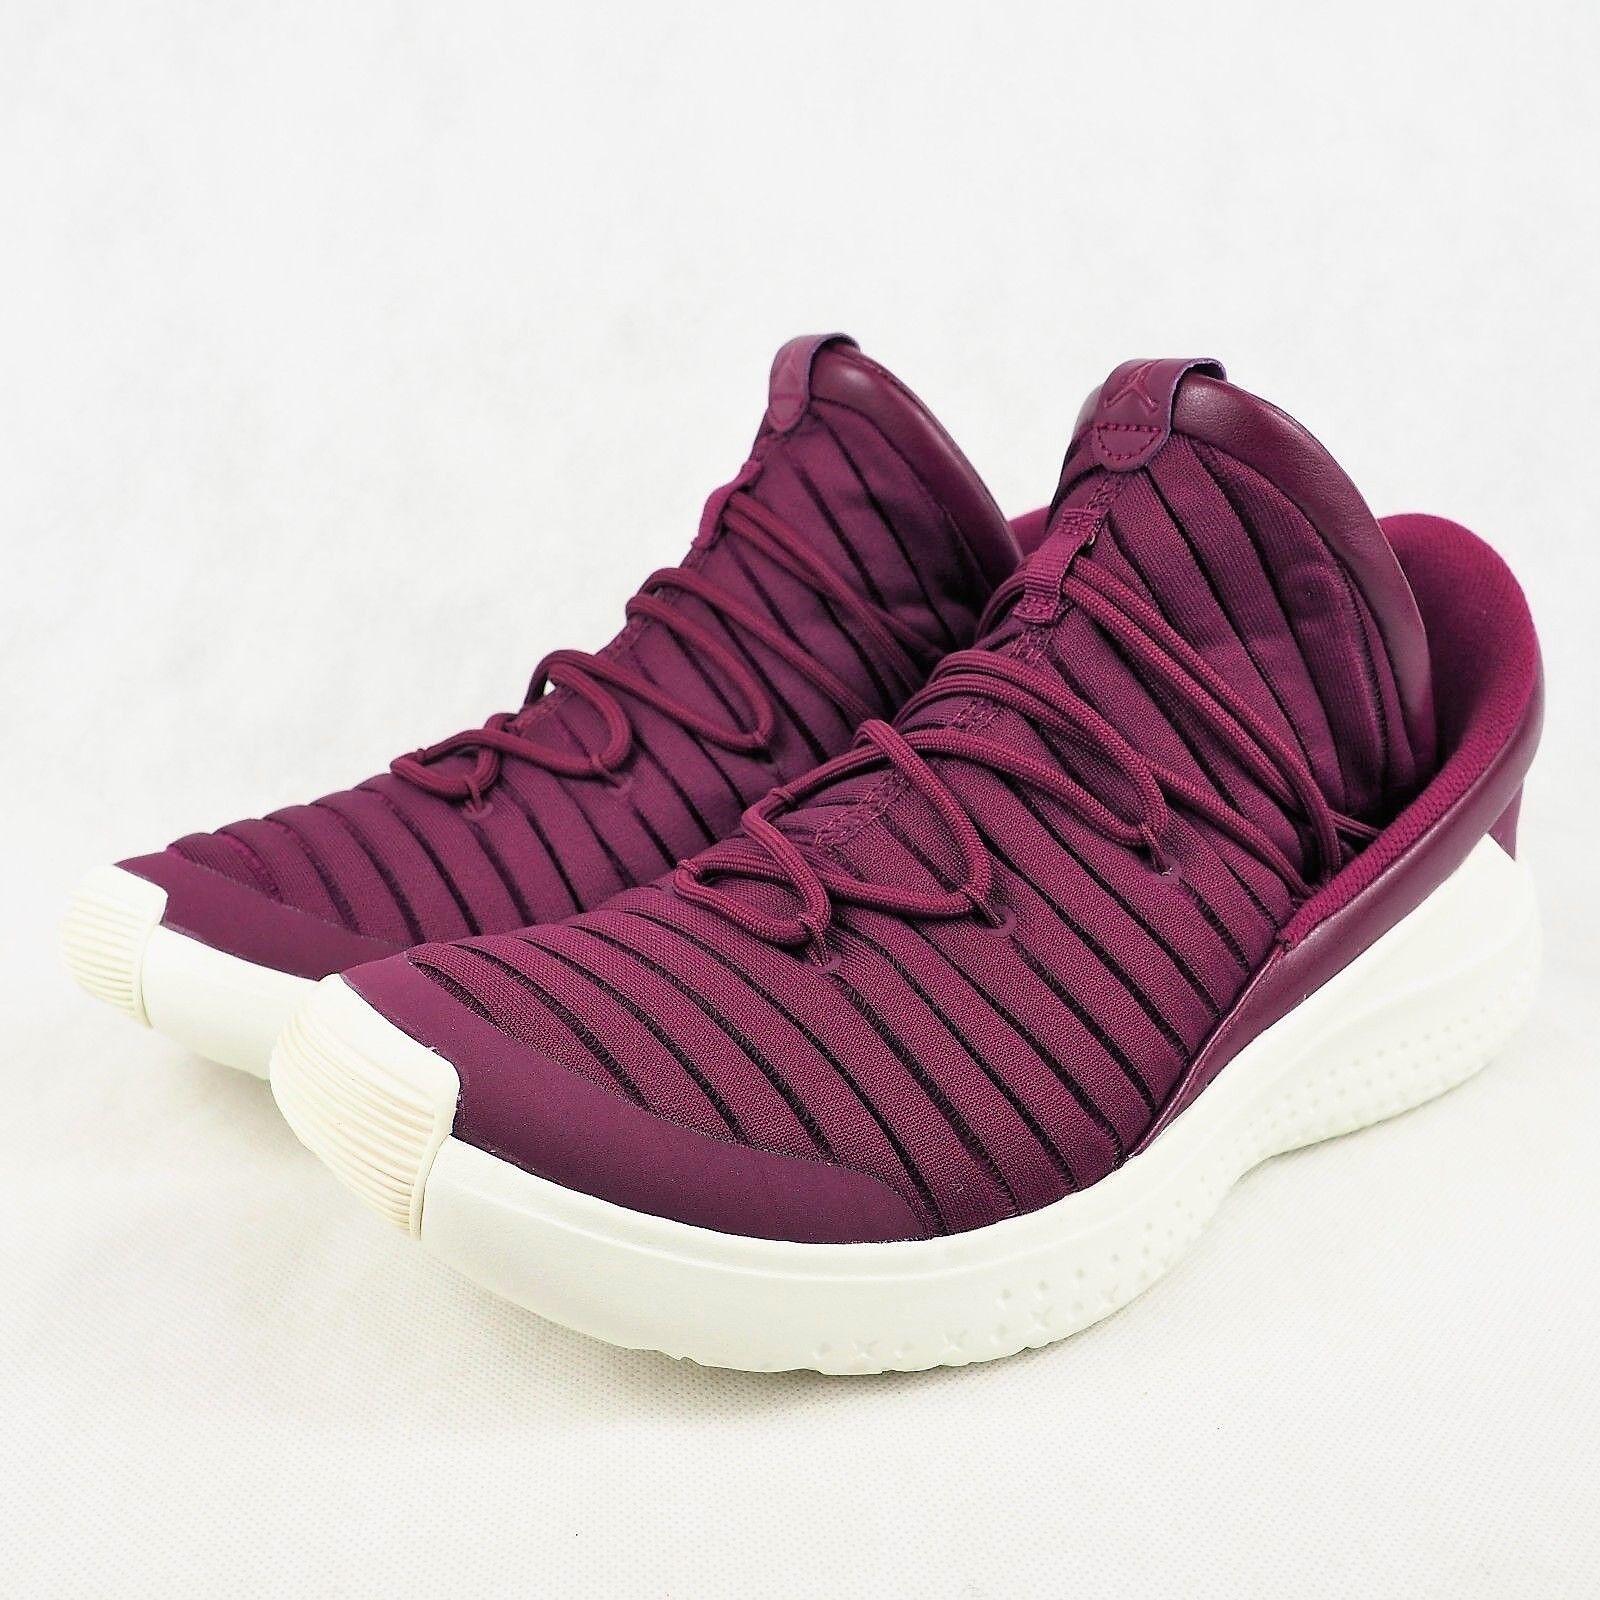 on sale 8b7f4 b3930 Nike Jordan Flight Luxe Training shoes shoes shoes Mens Sizes 8 Bordeaux  Sail 919715 637 78f4e6